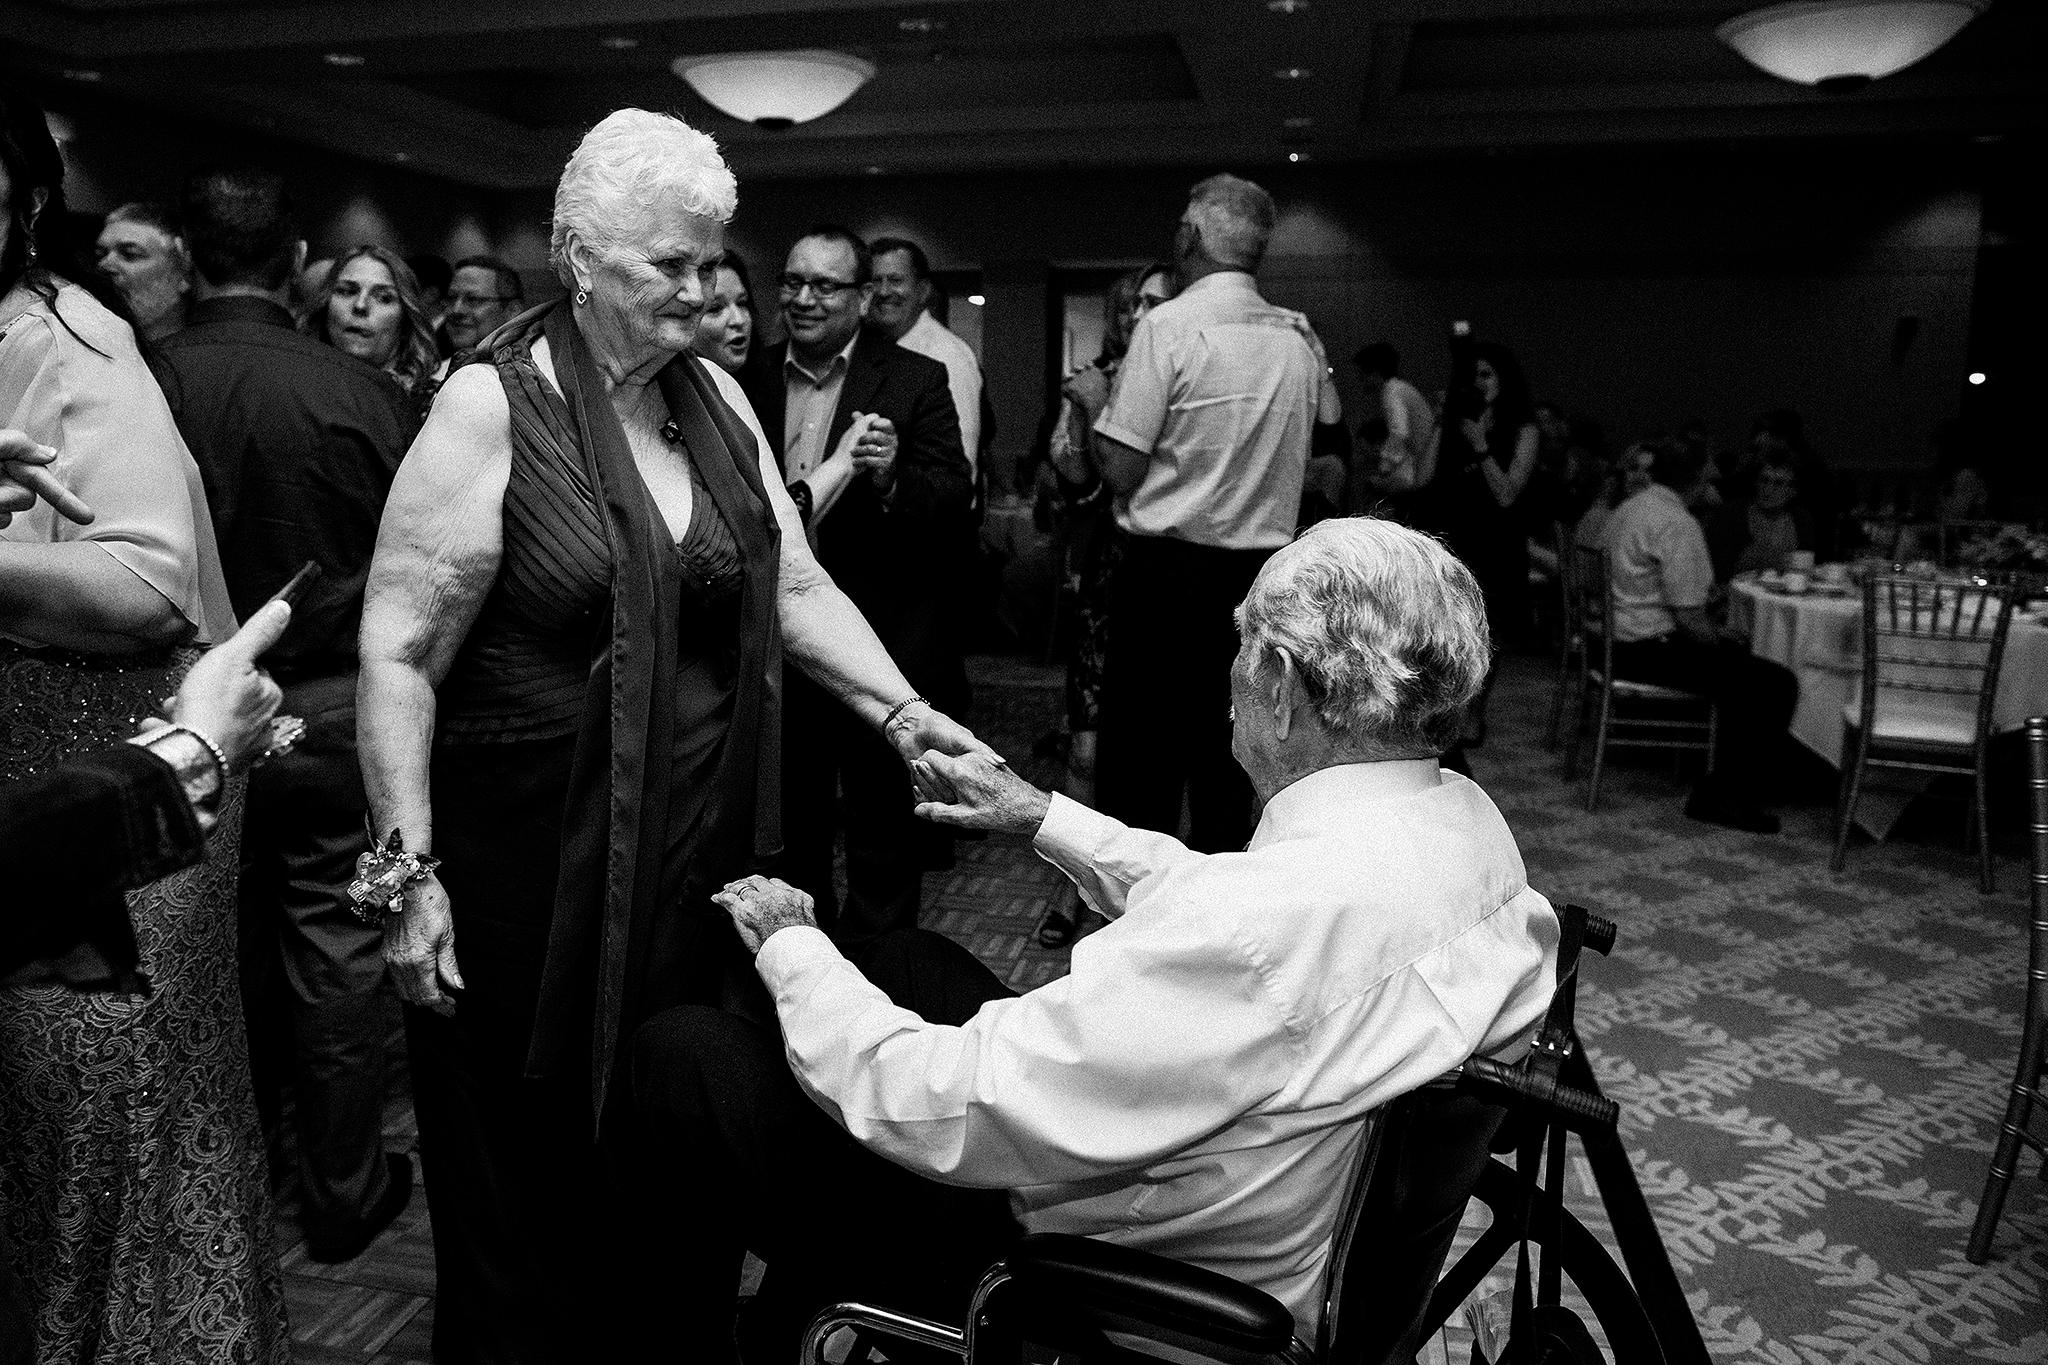 grandma and grandpa dancing during wedding reception | dekalb, il wedding photographer